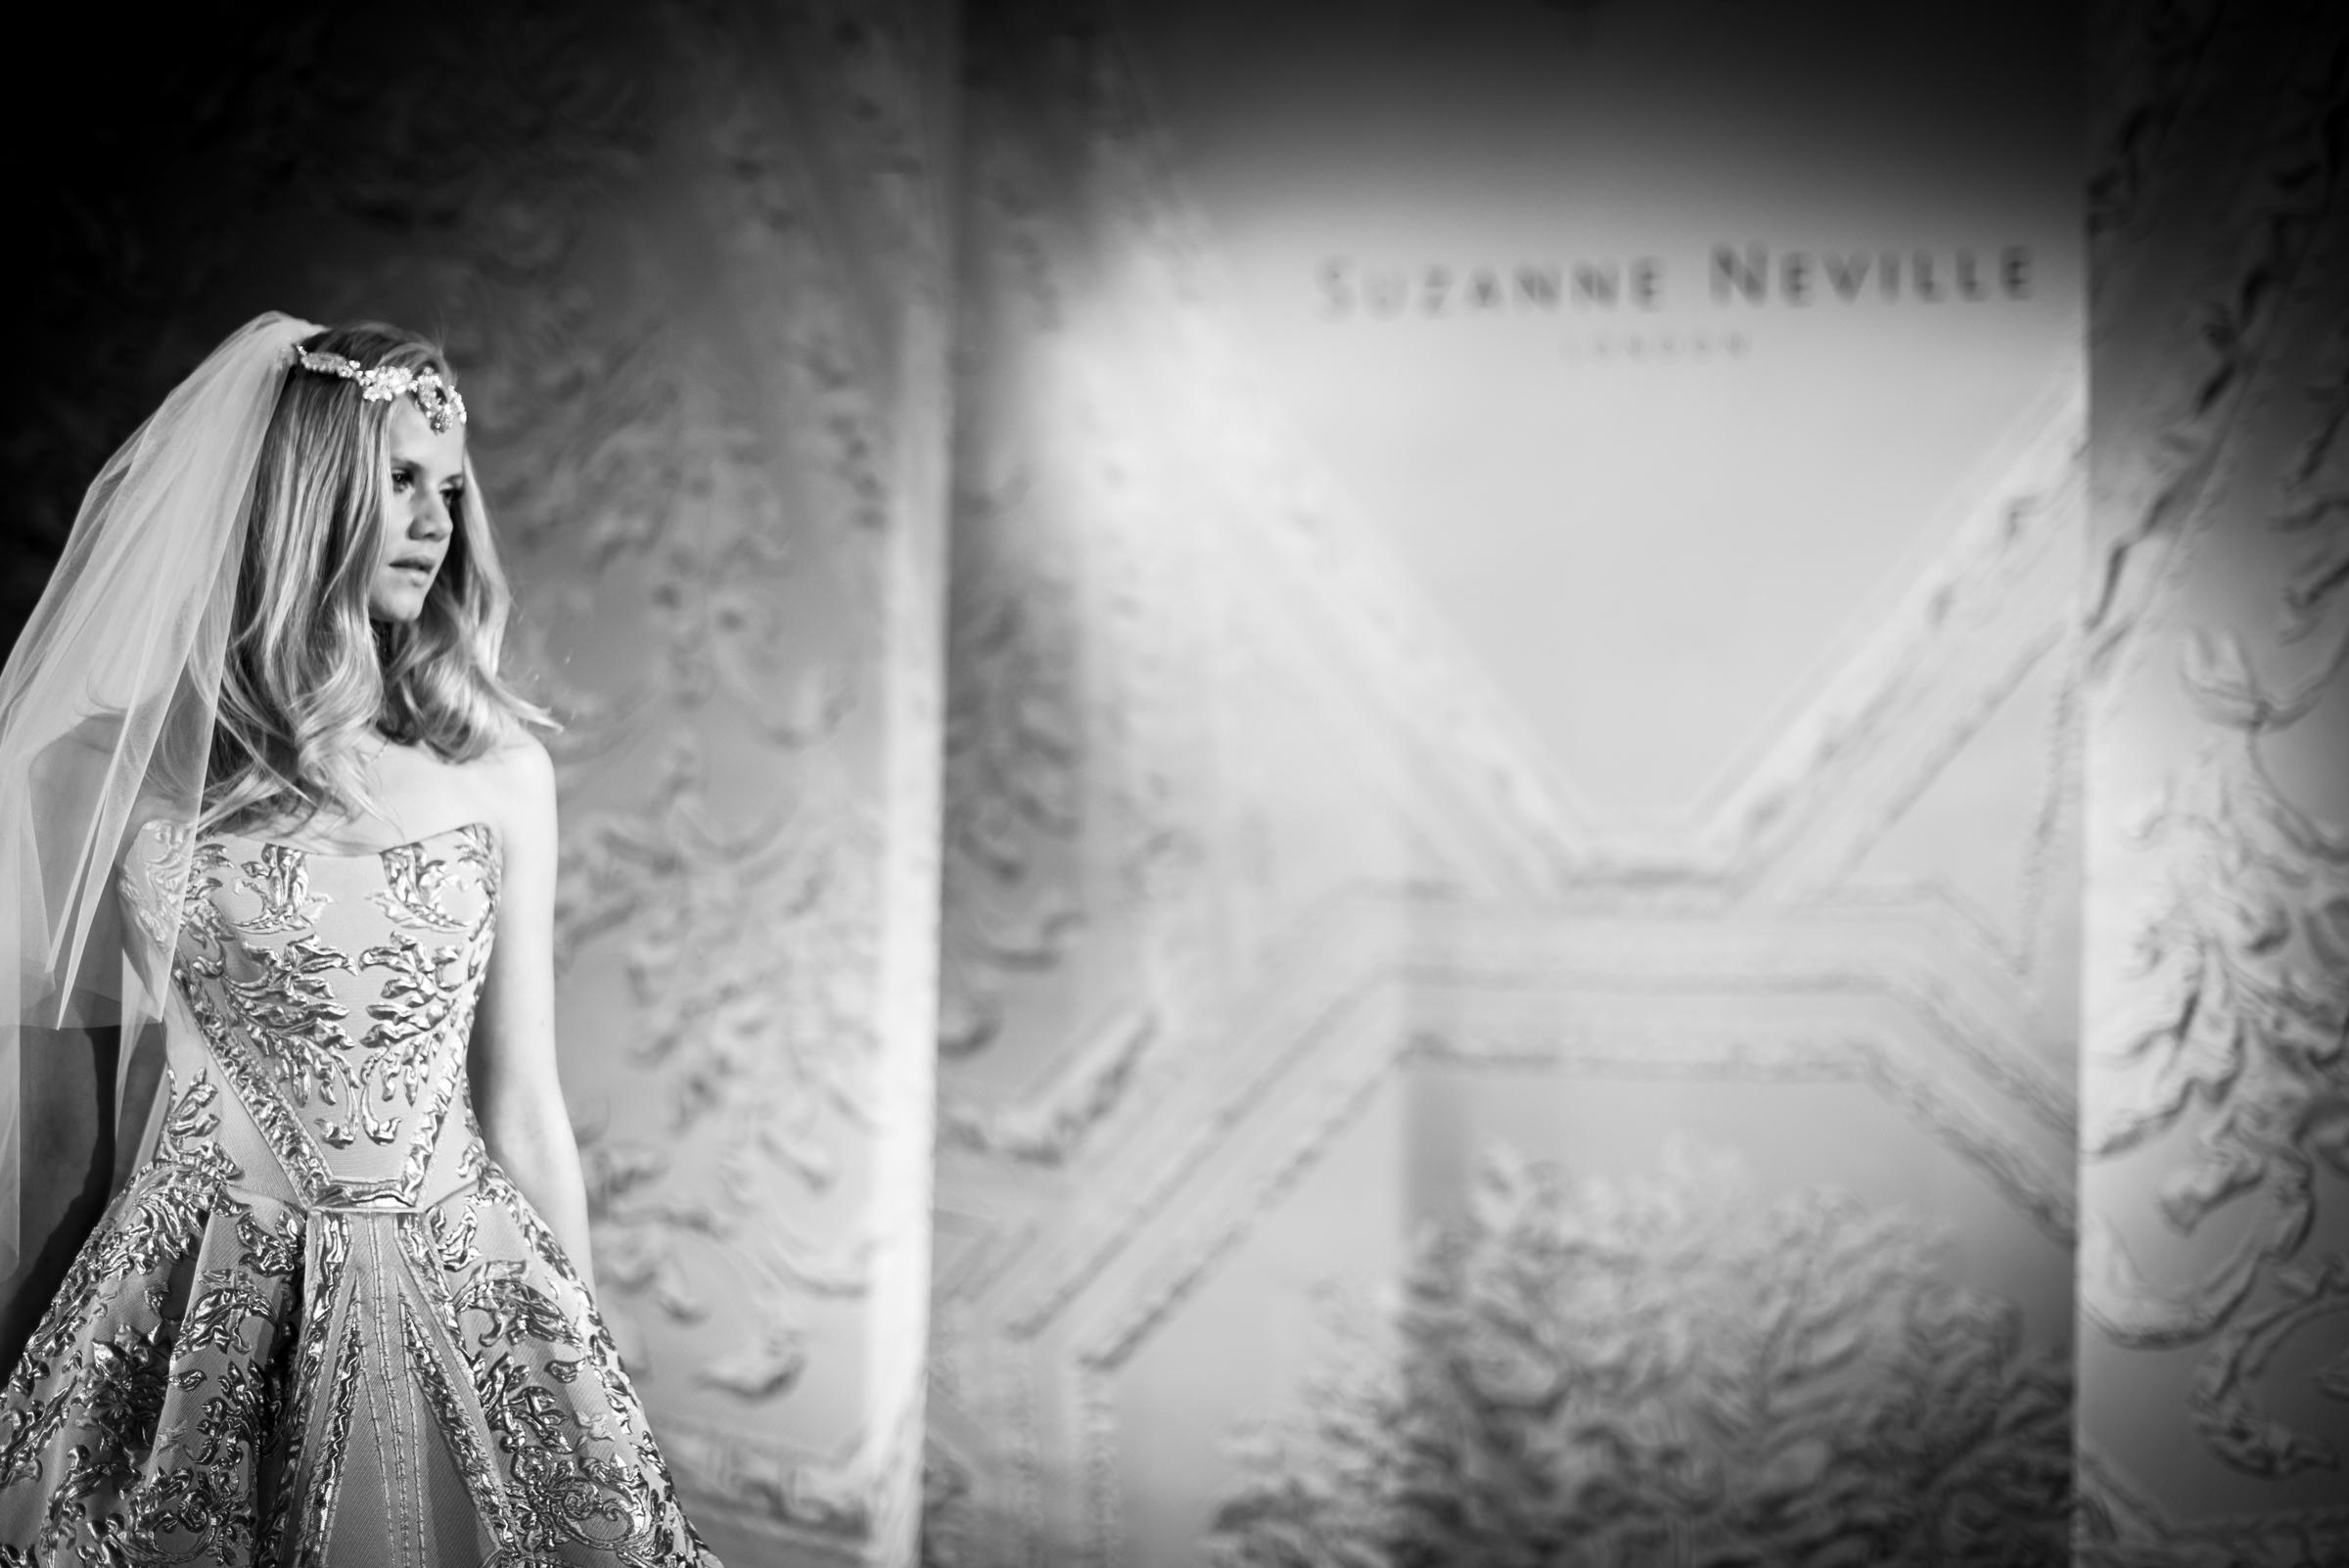 Portrait Collection - Candid shots - Juliet Mckee Photography-2 Suzanne Neville